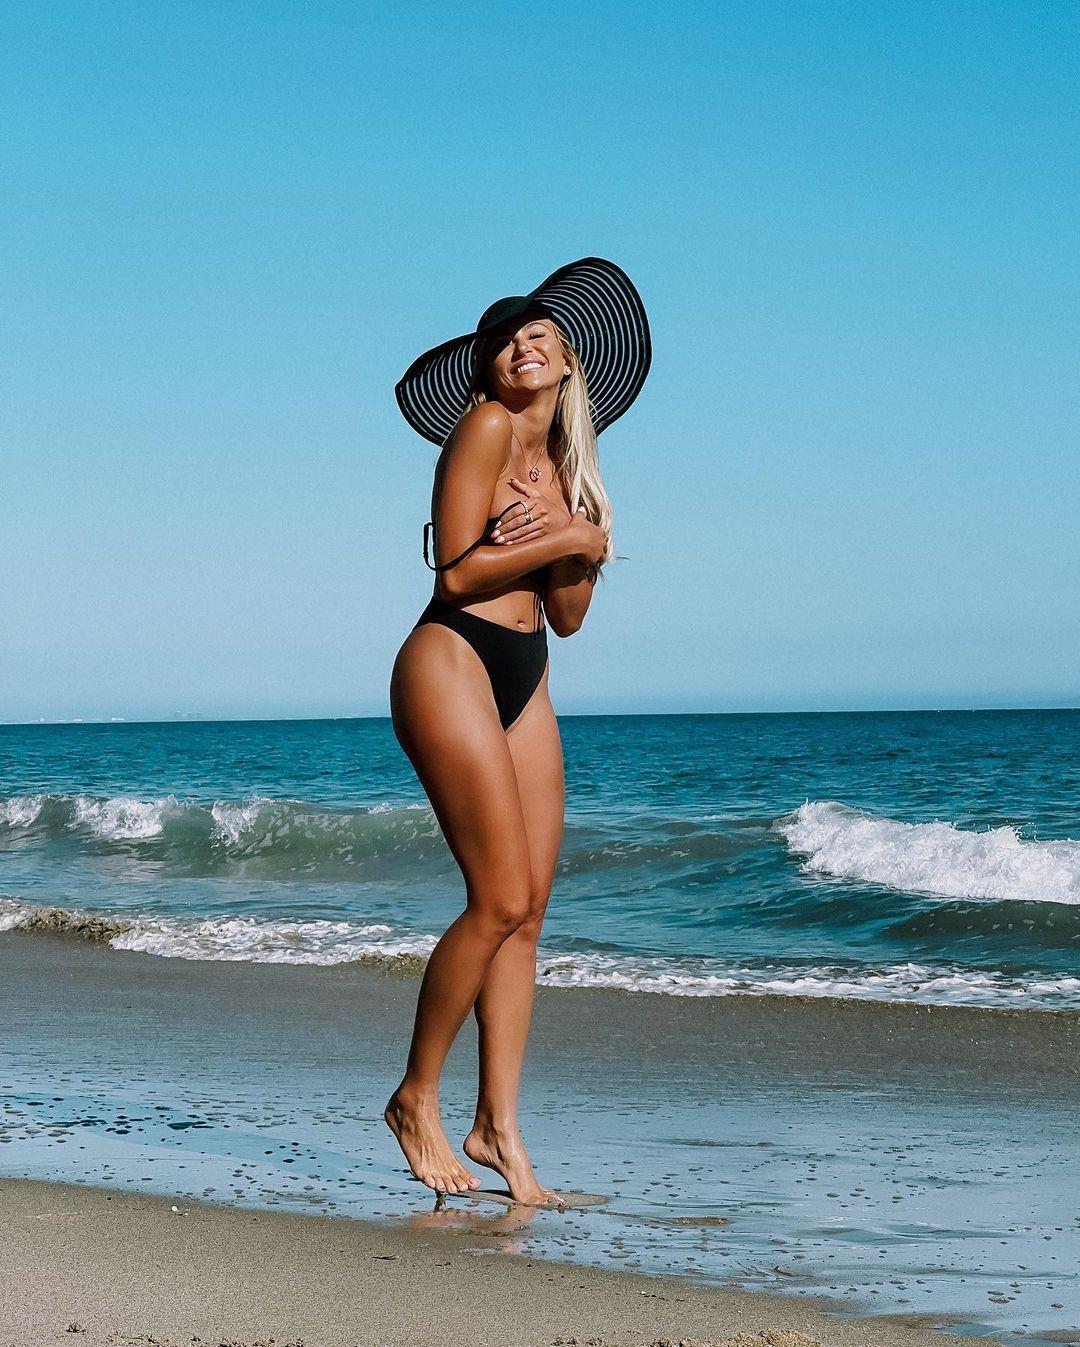 Khloe Terae Beautiful In Bikini